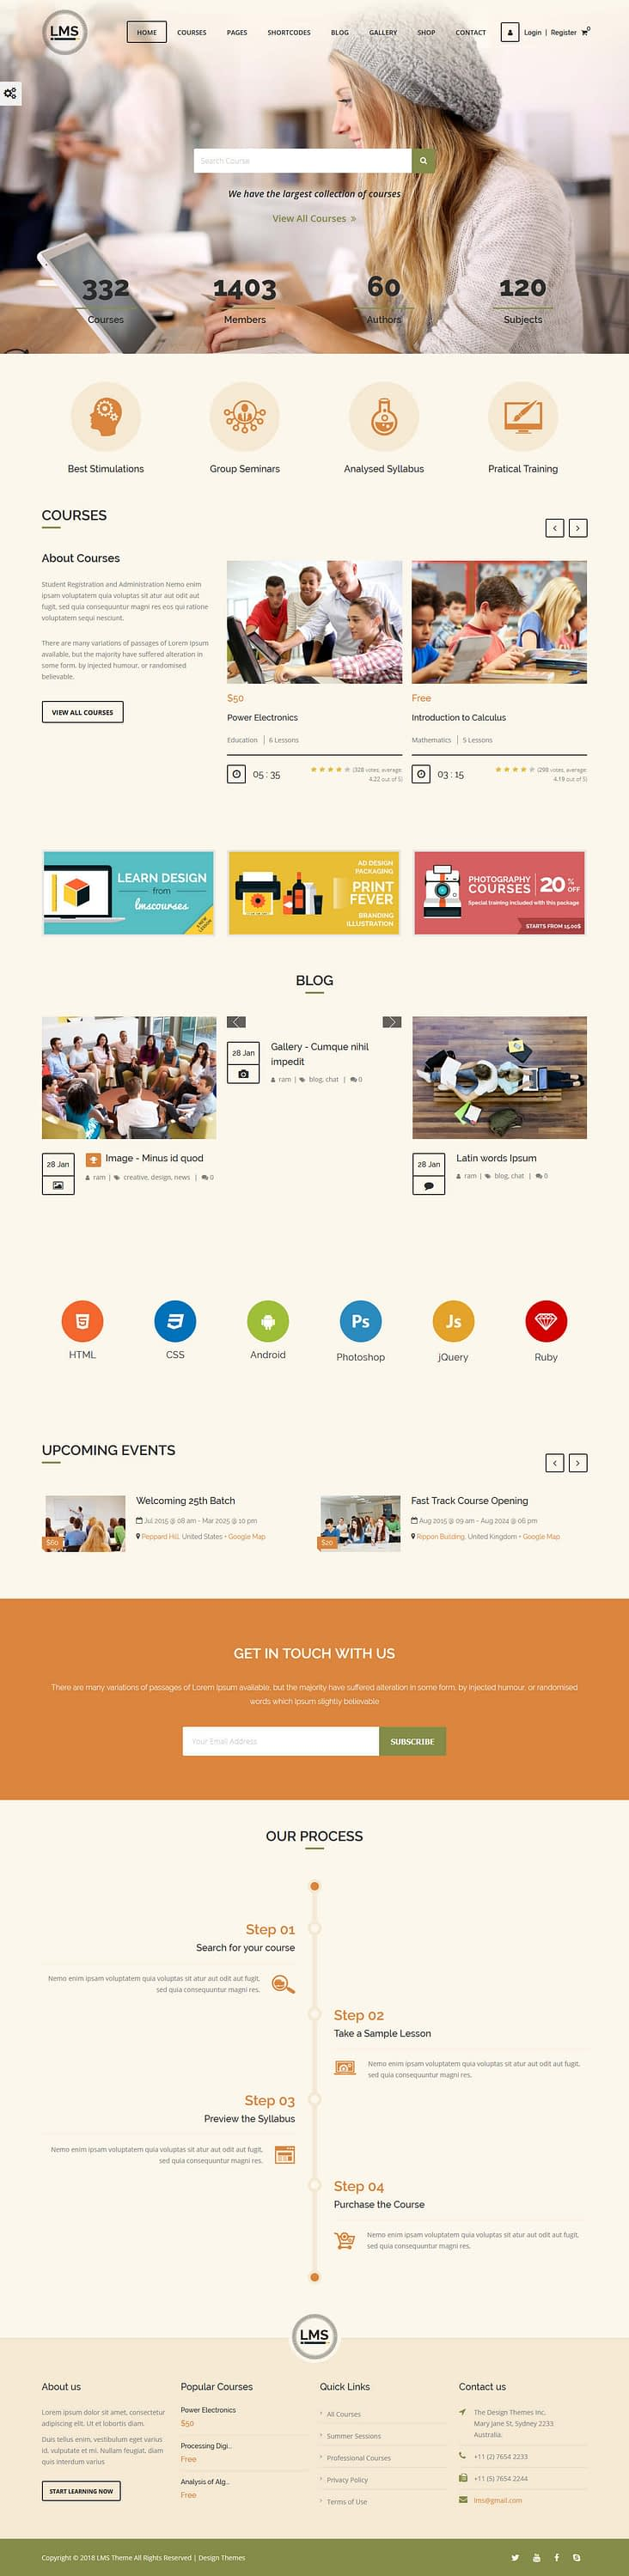 LMS - Best Premium LMS WordPress Theme